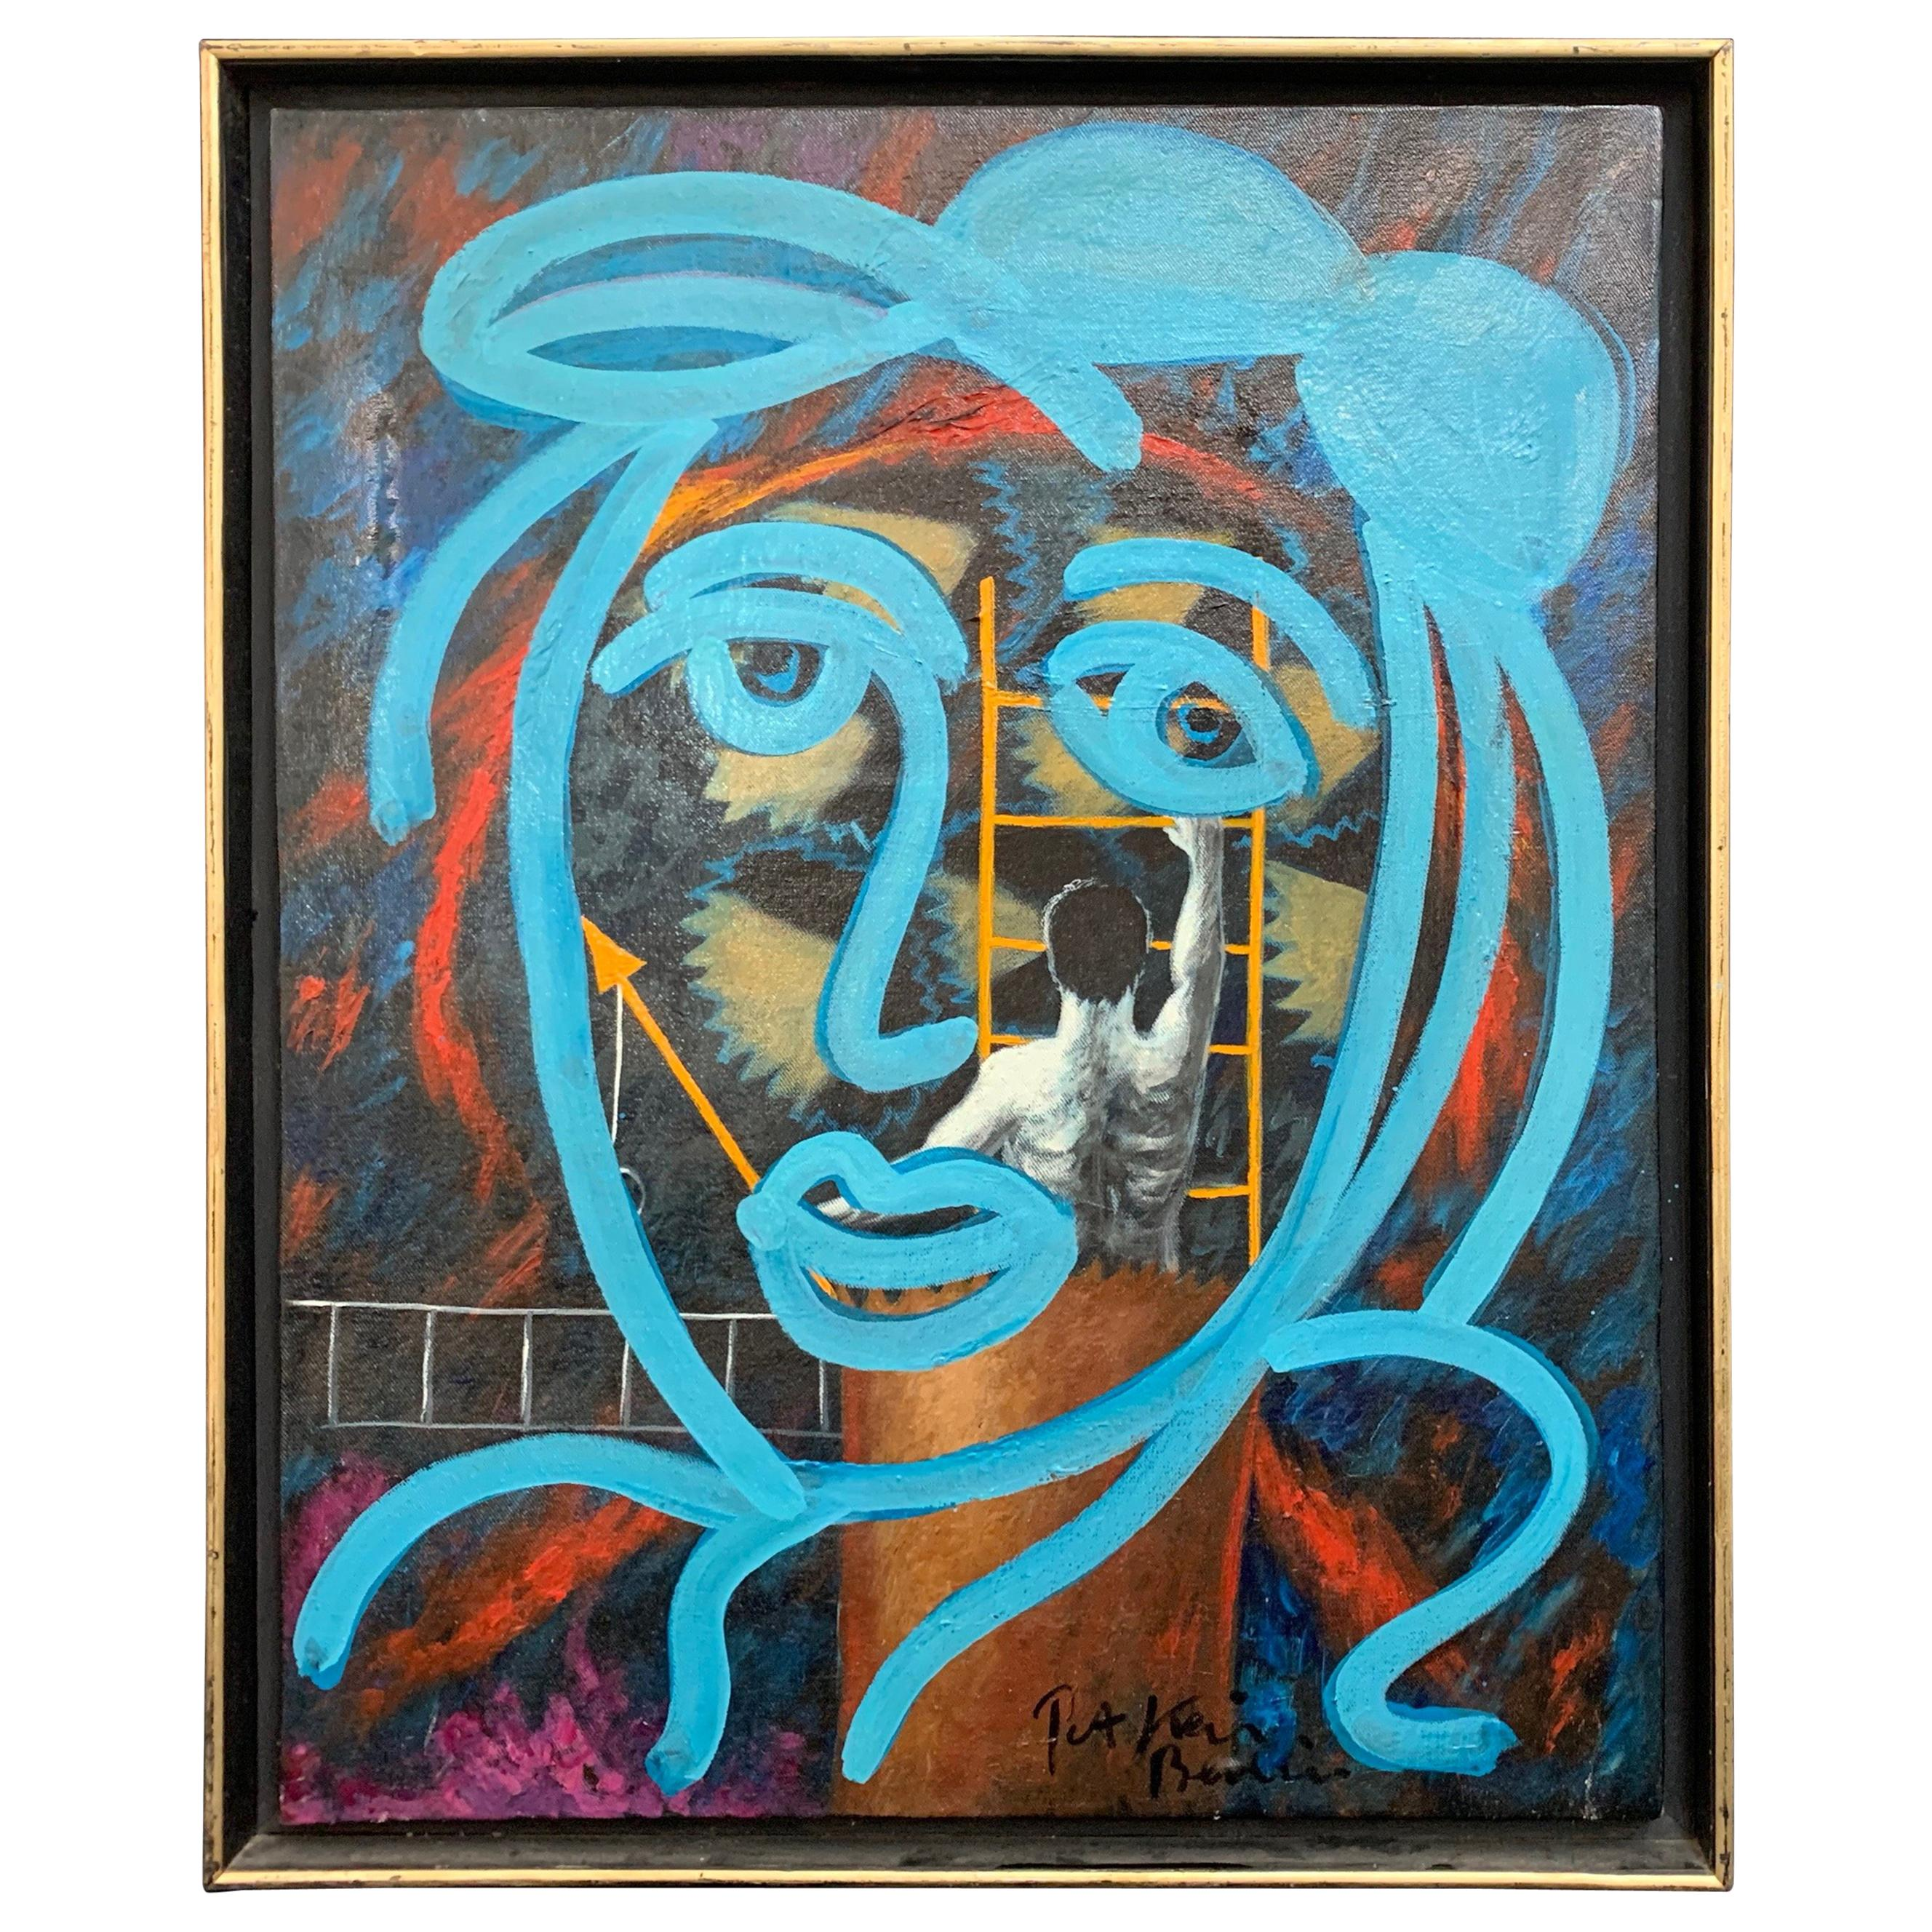 Peter Keil Expressionist Oil Portrait Painting, Framed